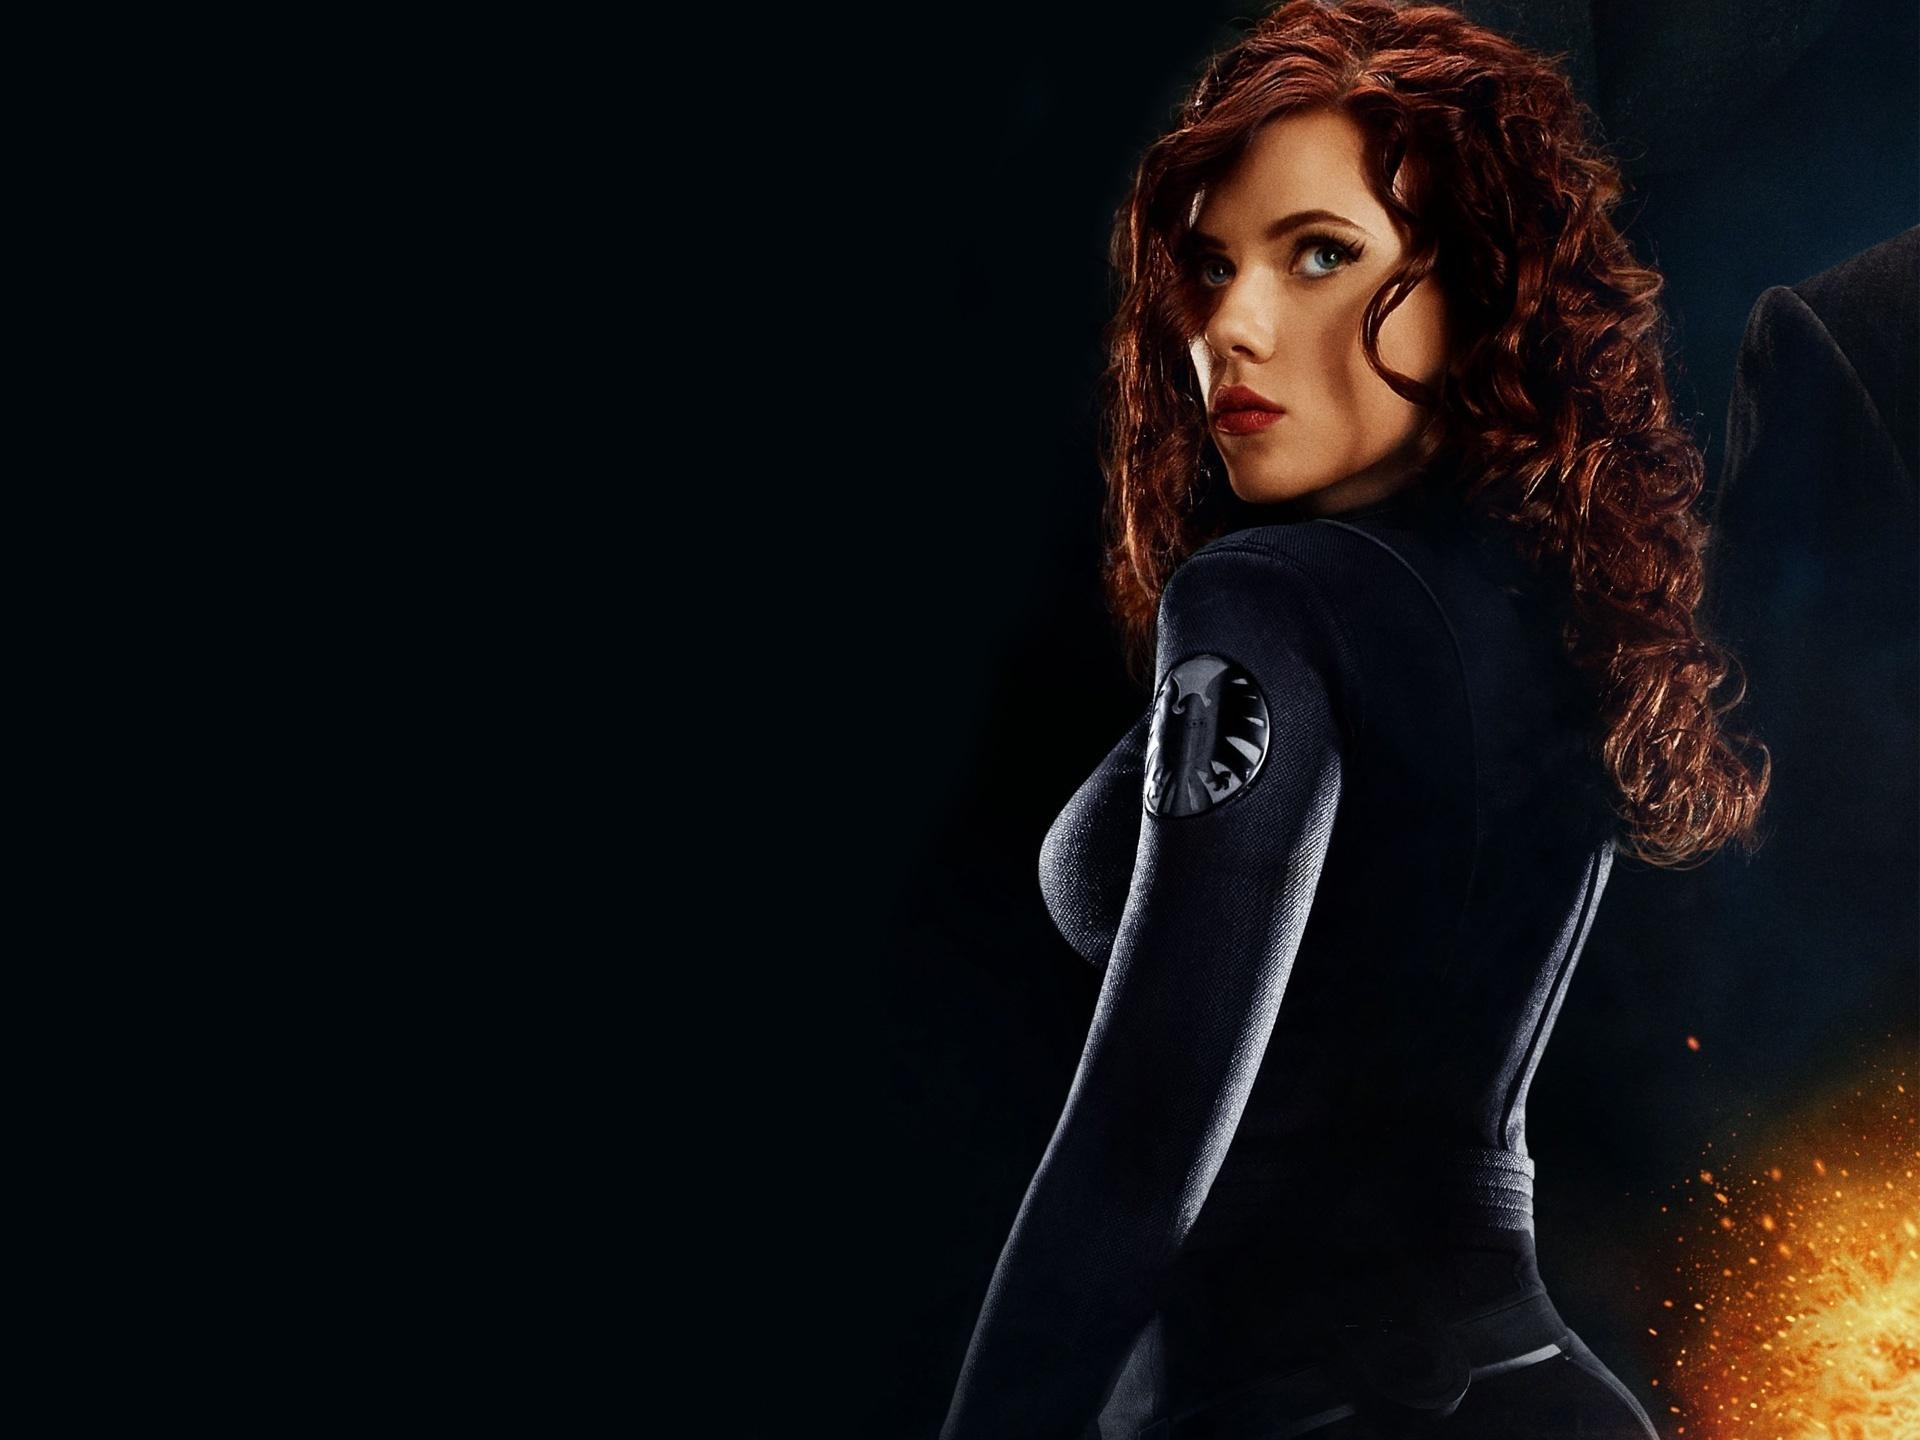 Female Ass-Kickers fondo de pantalla probably containing a well dressed person, an outerwear. Natasha Romanov/Black Widow.